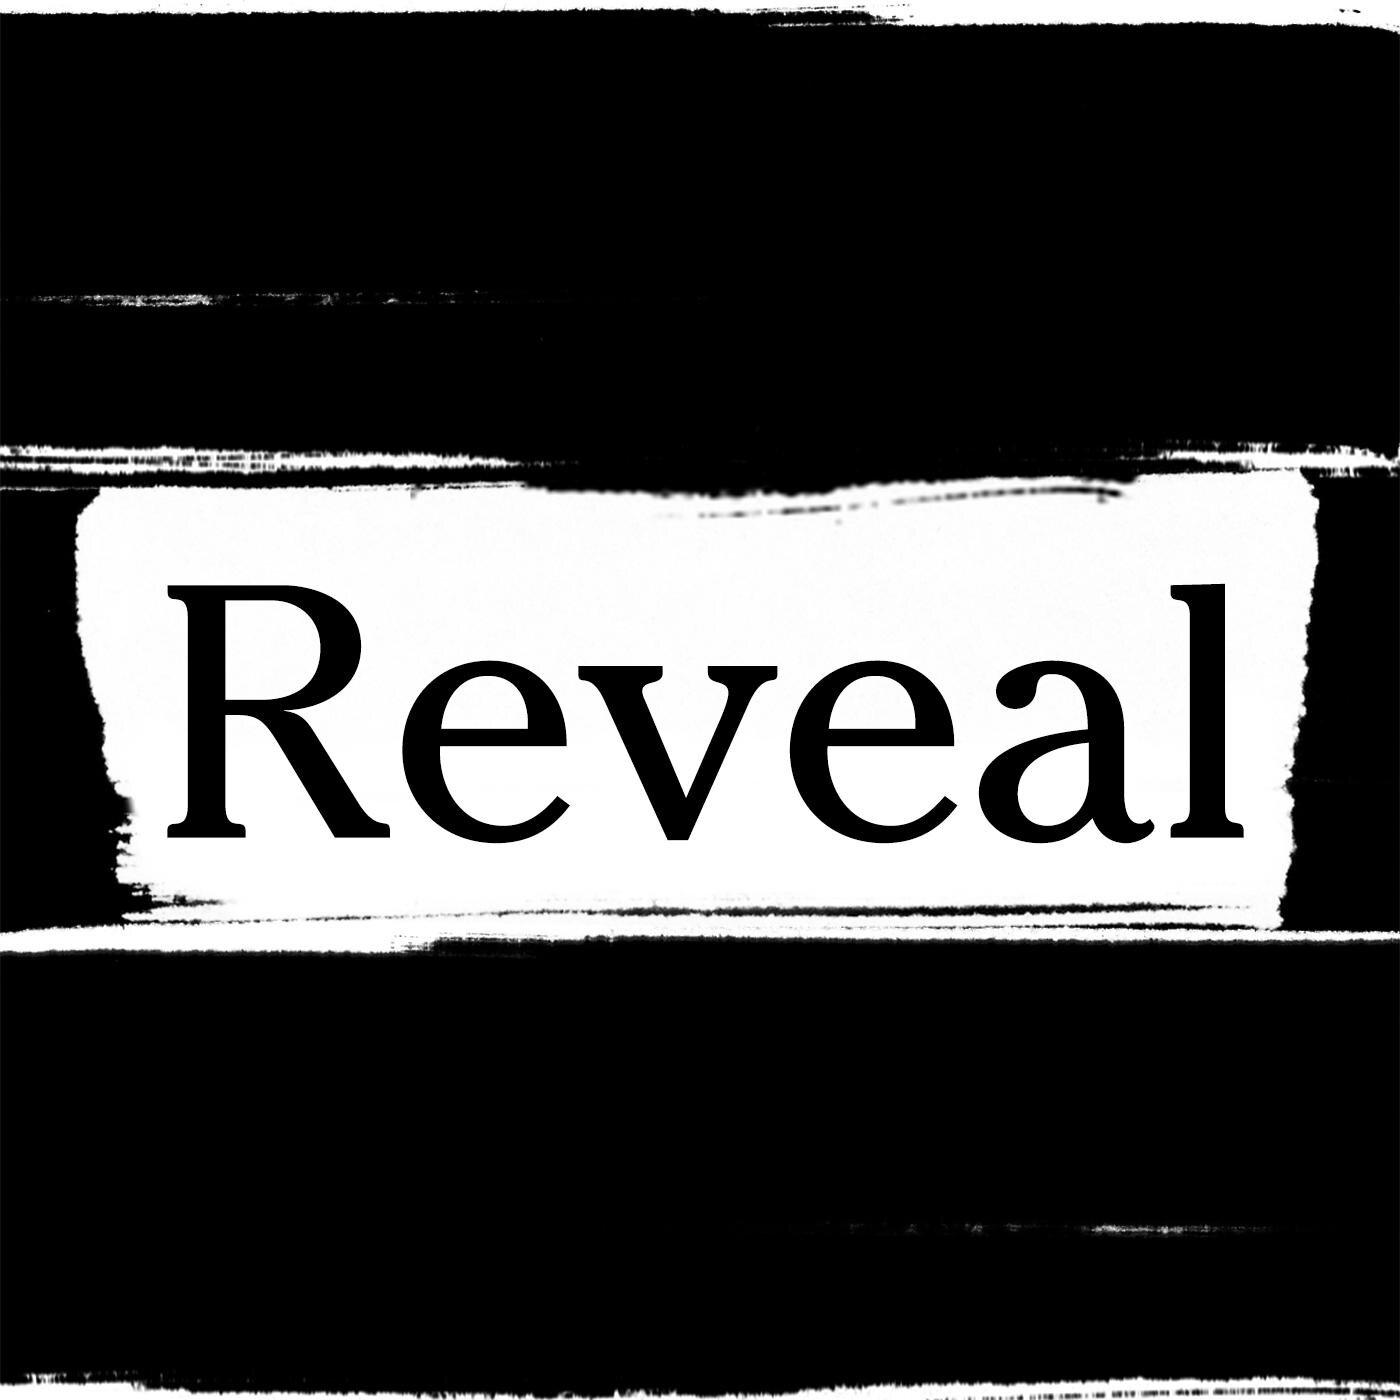 reveal.jpg